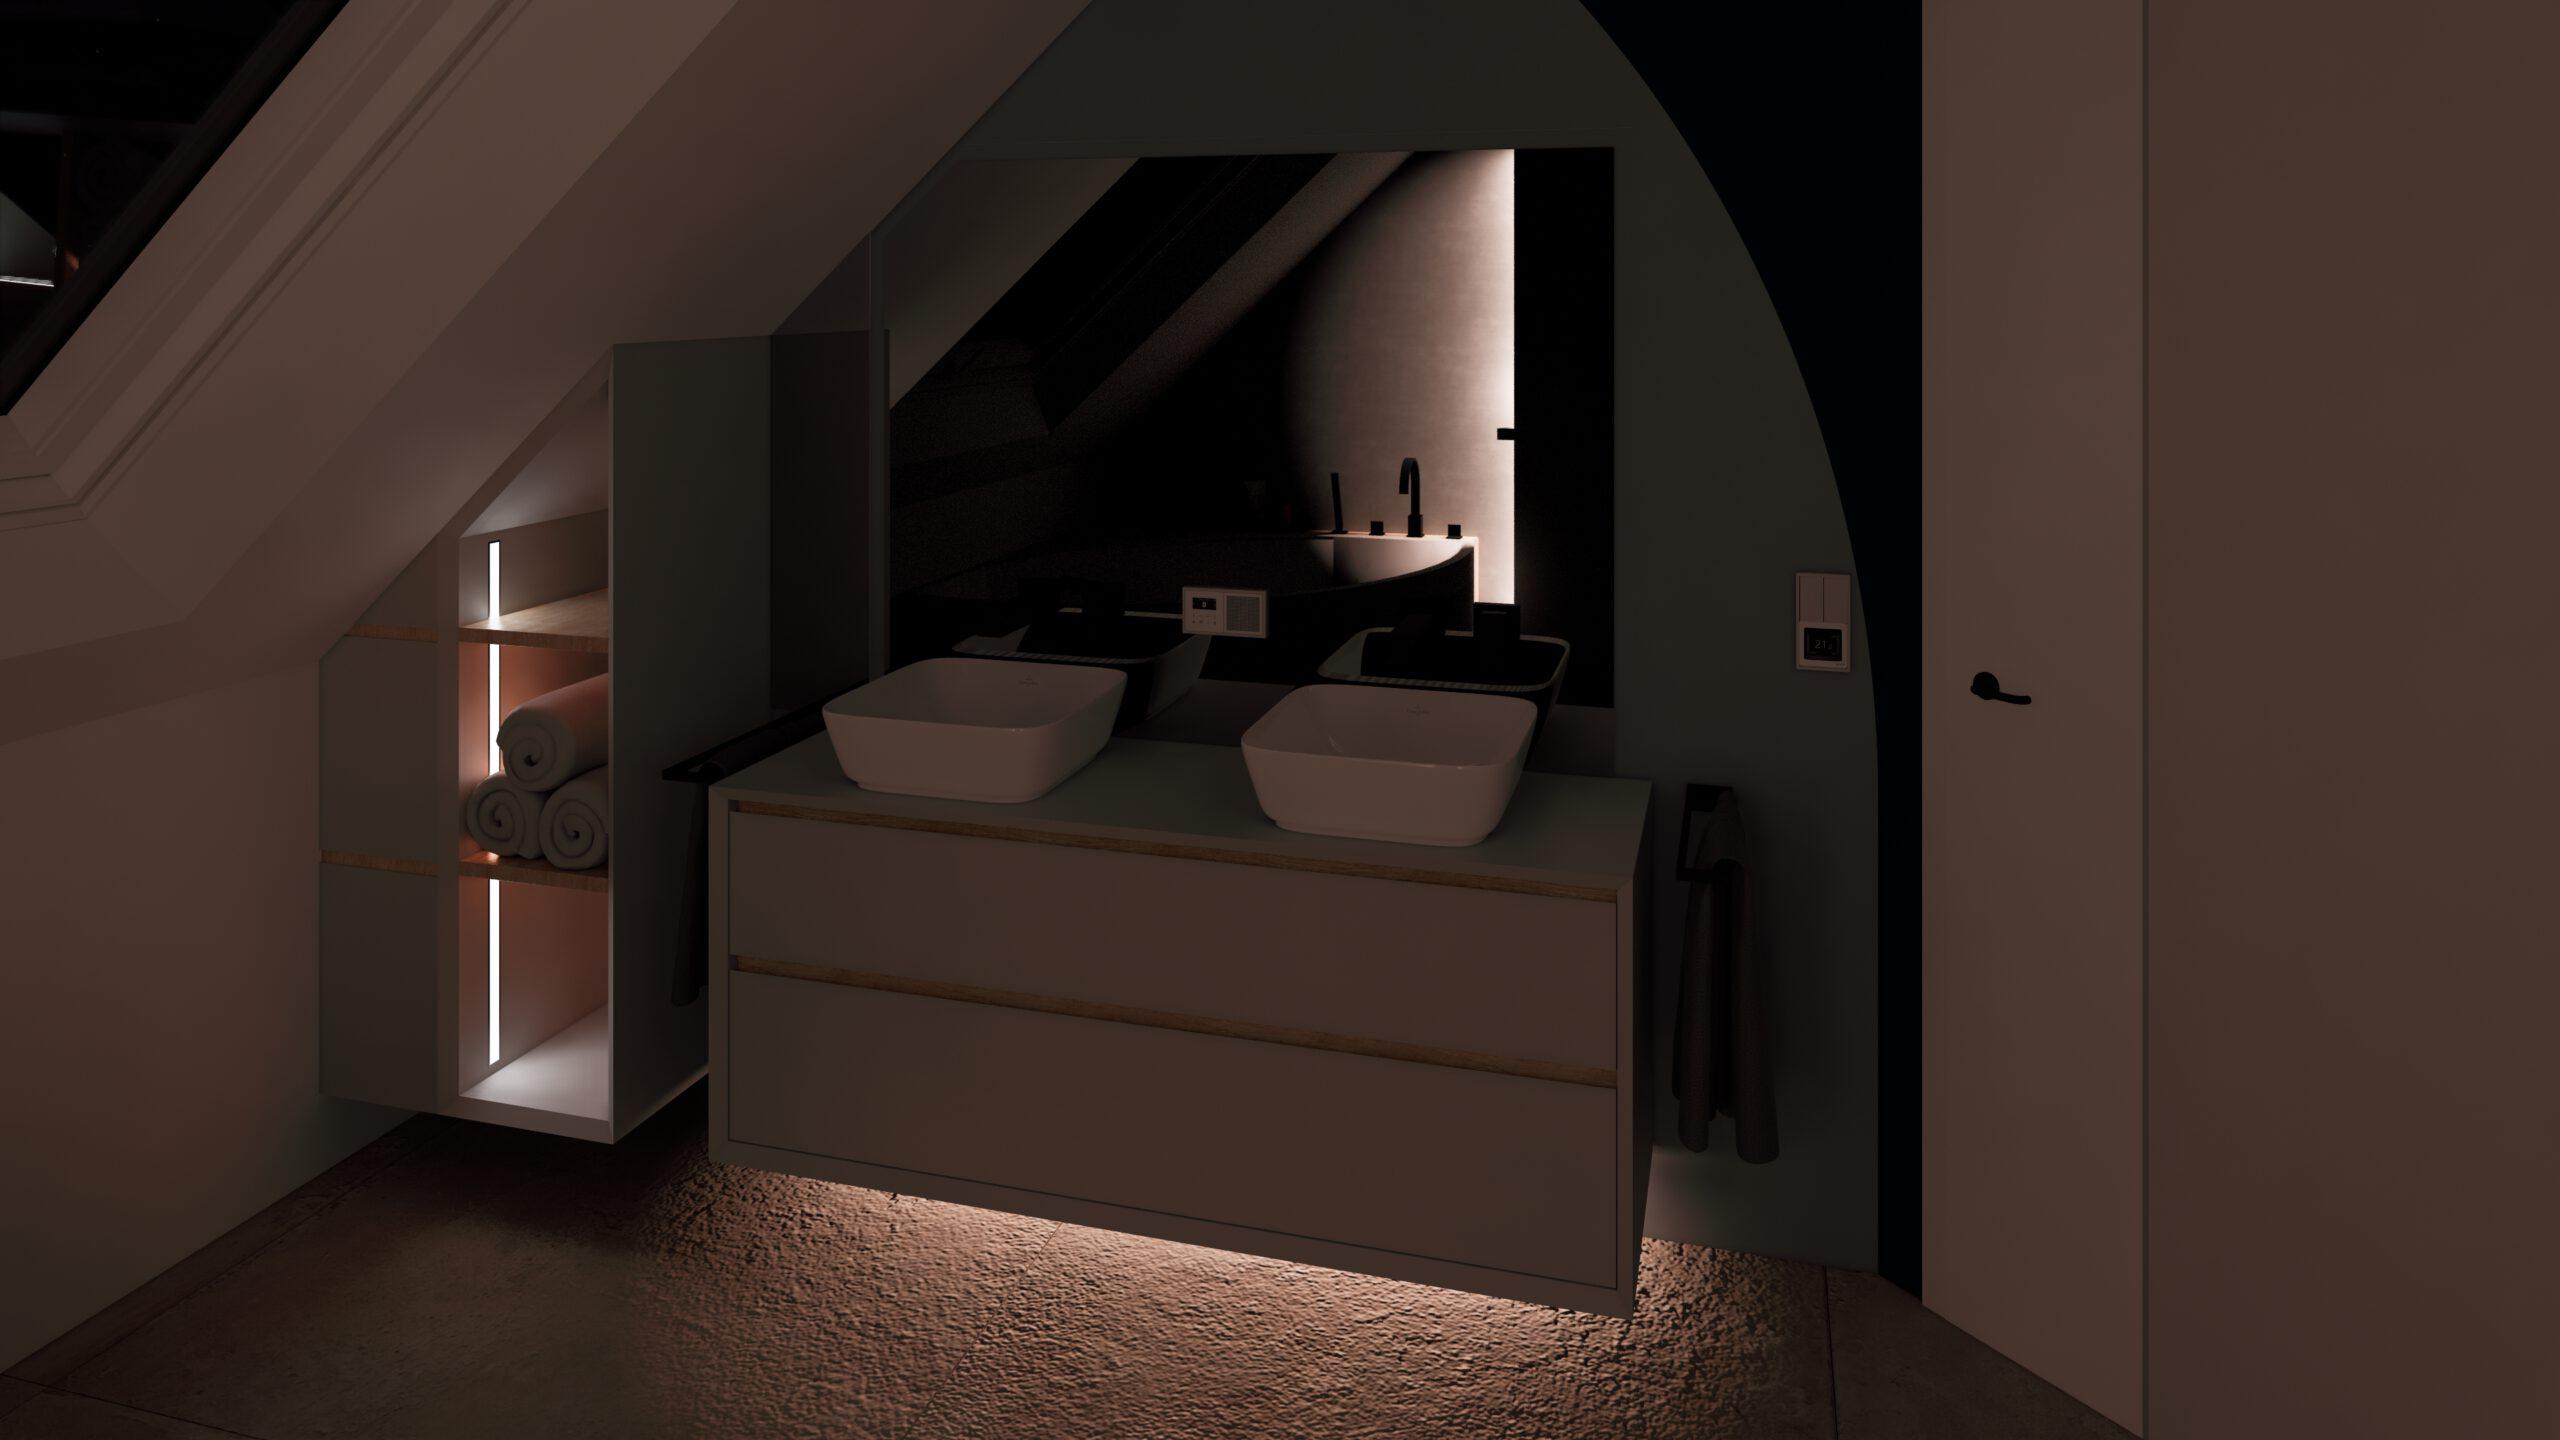 Badezimmer Fliesen Waschtisch Waschbecken LED Beleuchtung Amaturen Gessi Jung Spiegel